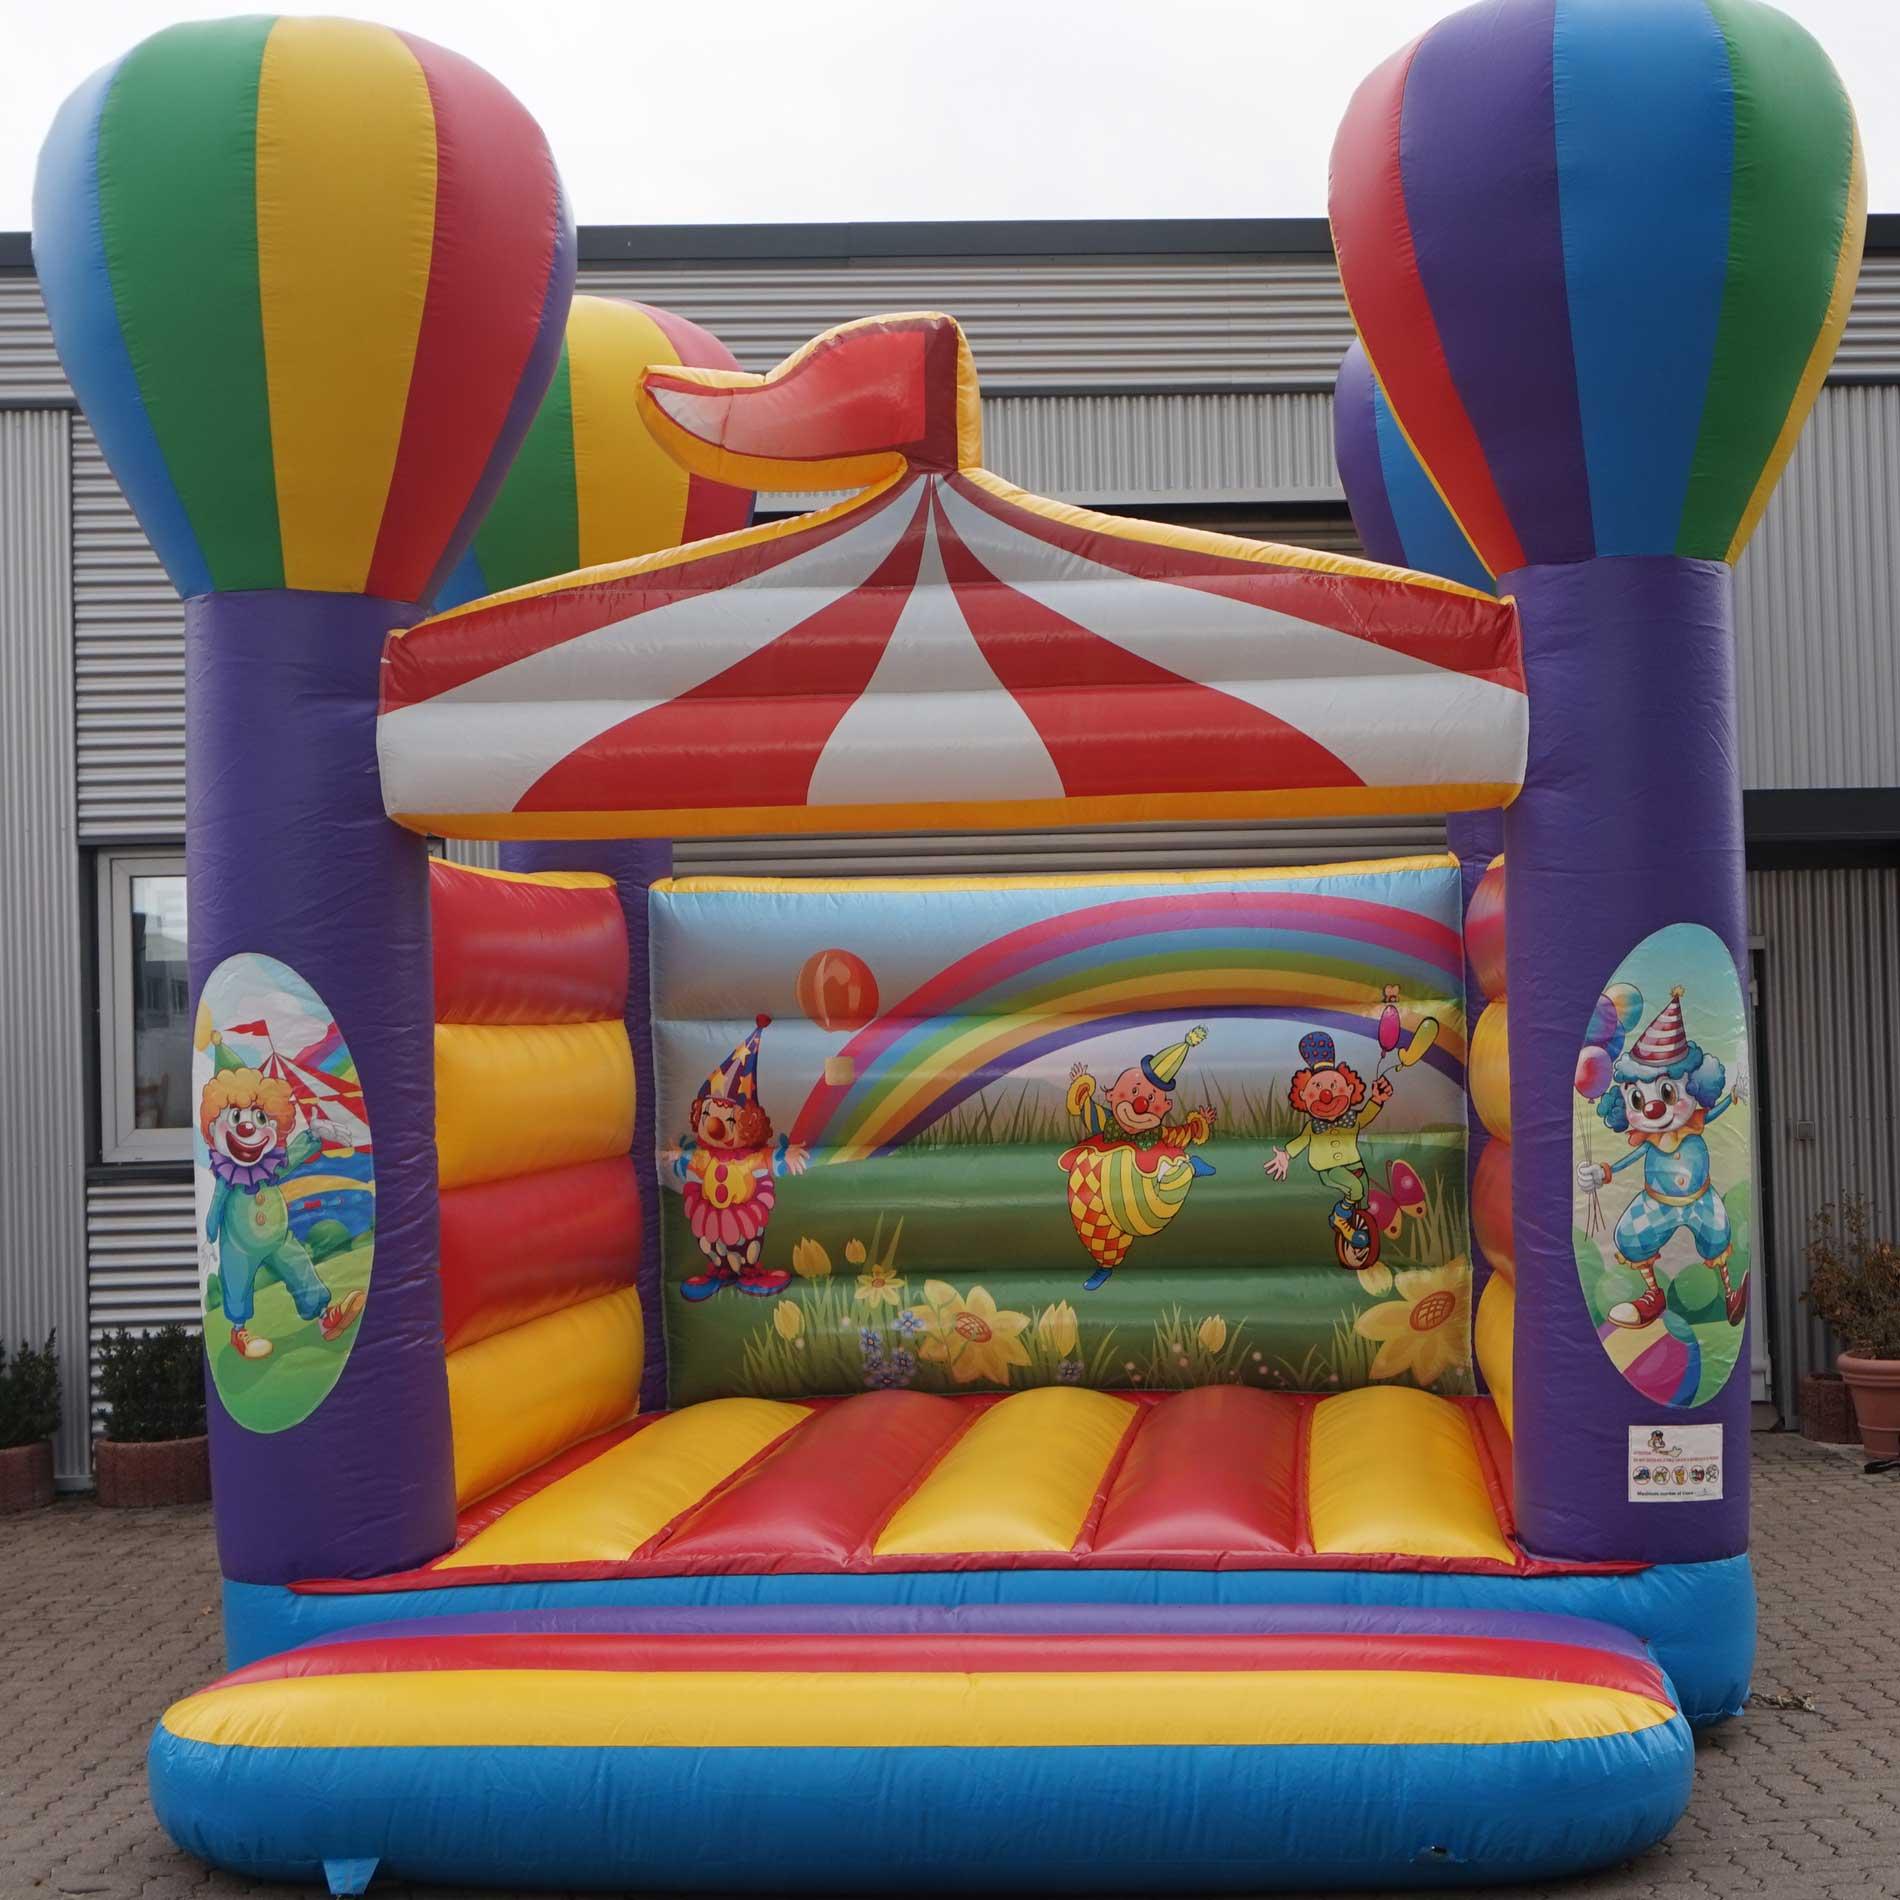 Kinderhüpfburg mit lustigen Zirkus-Motiven